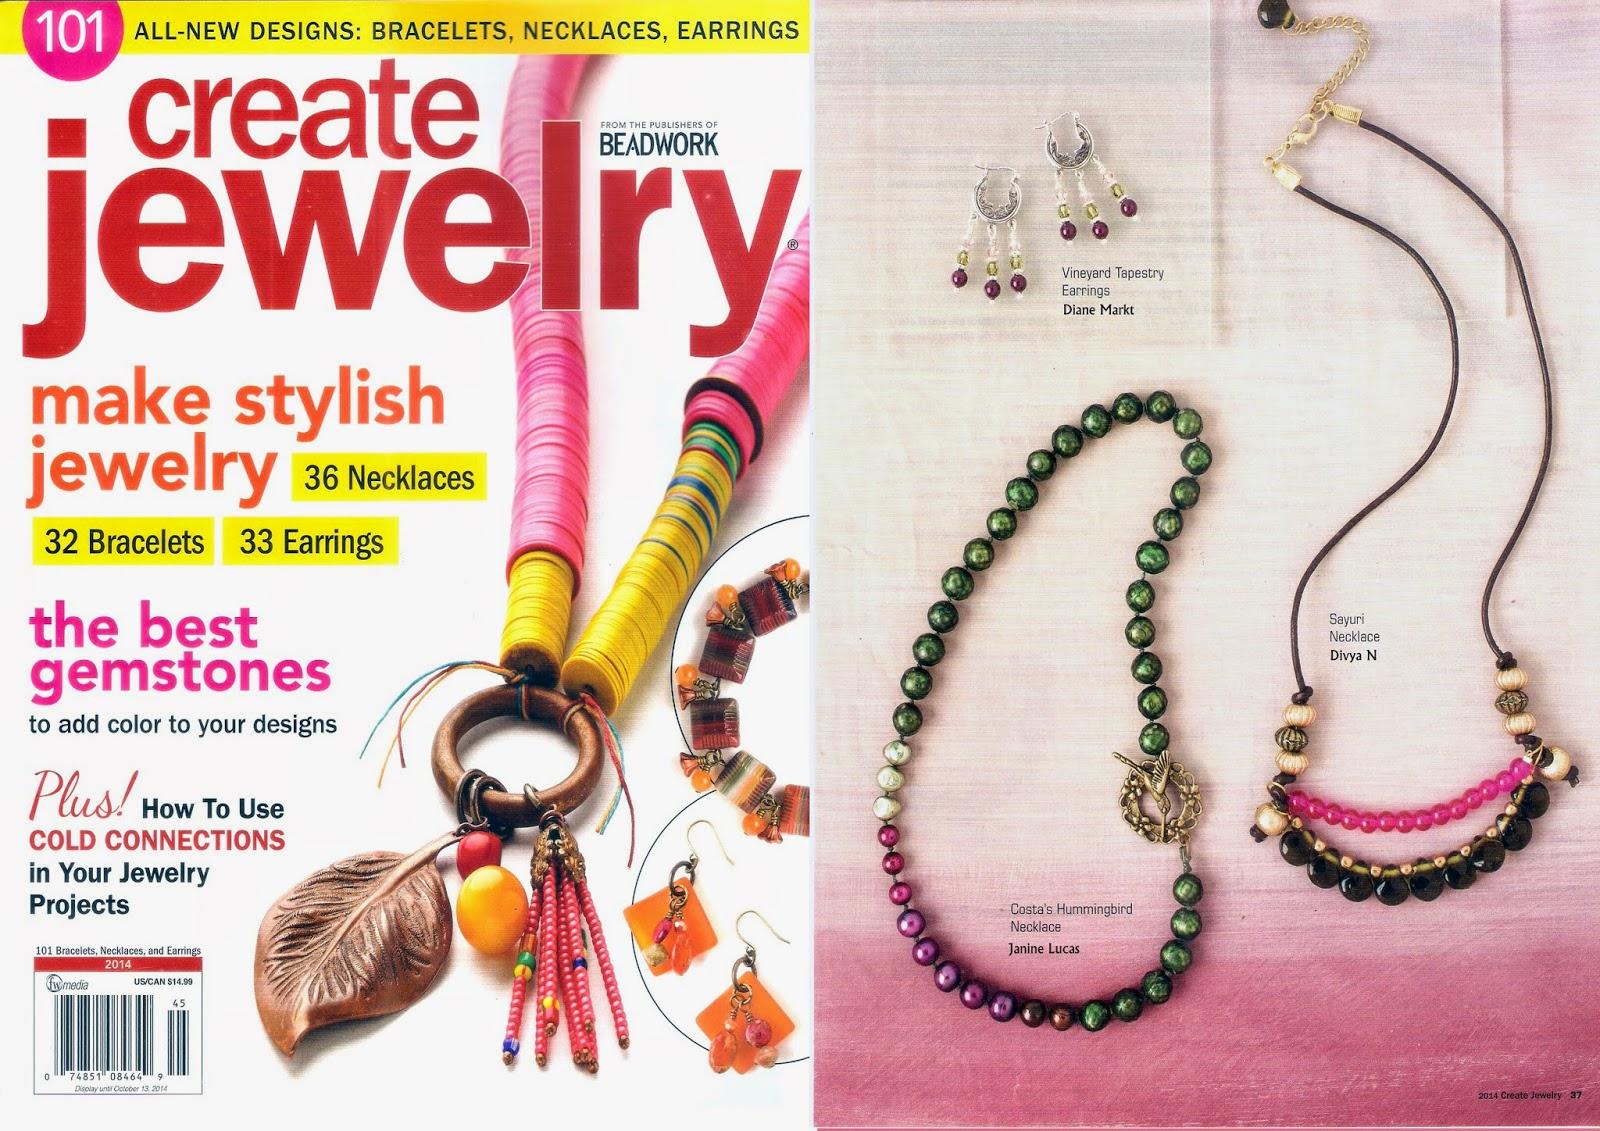 Sayuri Necklace, feathers in flight, create jewelry magazine